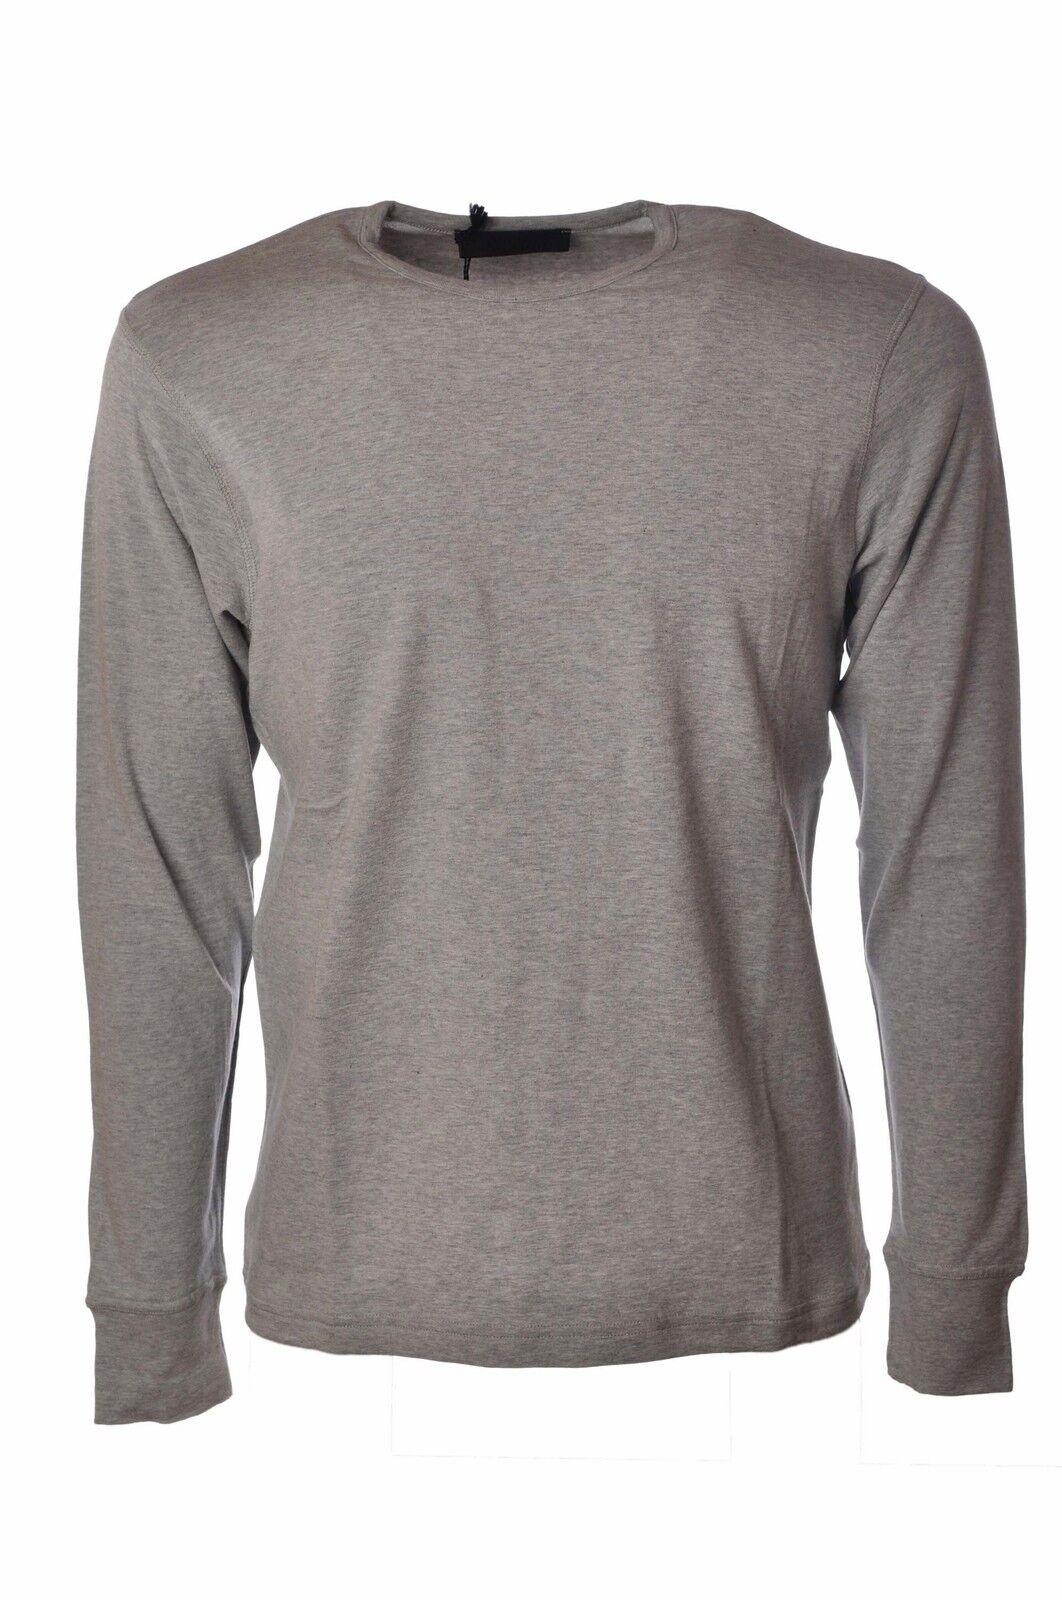 Alpha - Topwear-T-shirts - Man - Grau - 3765022B183912